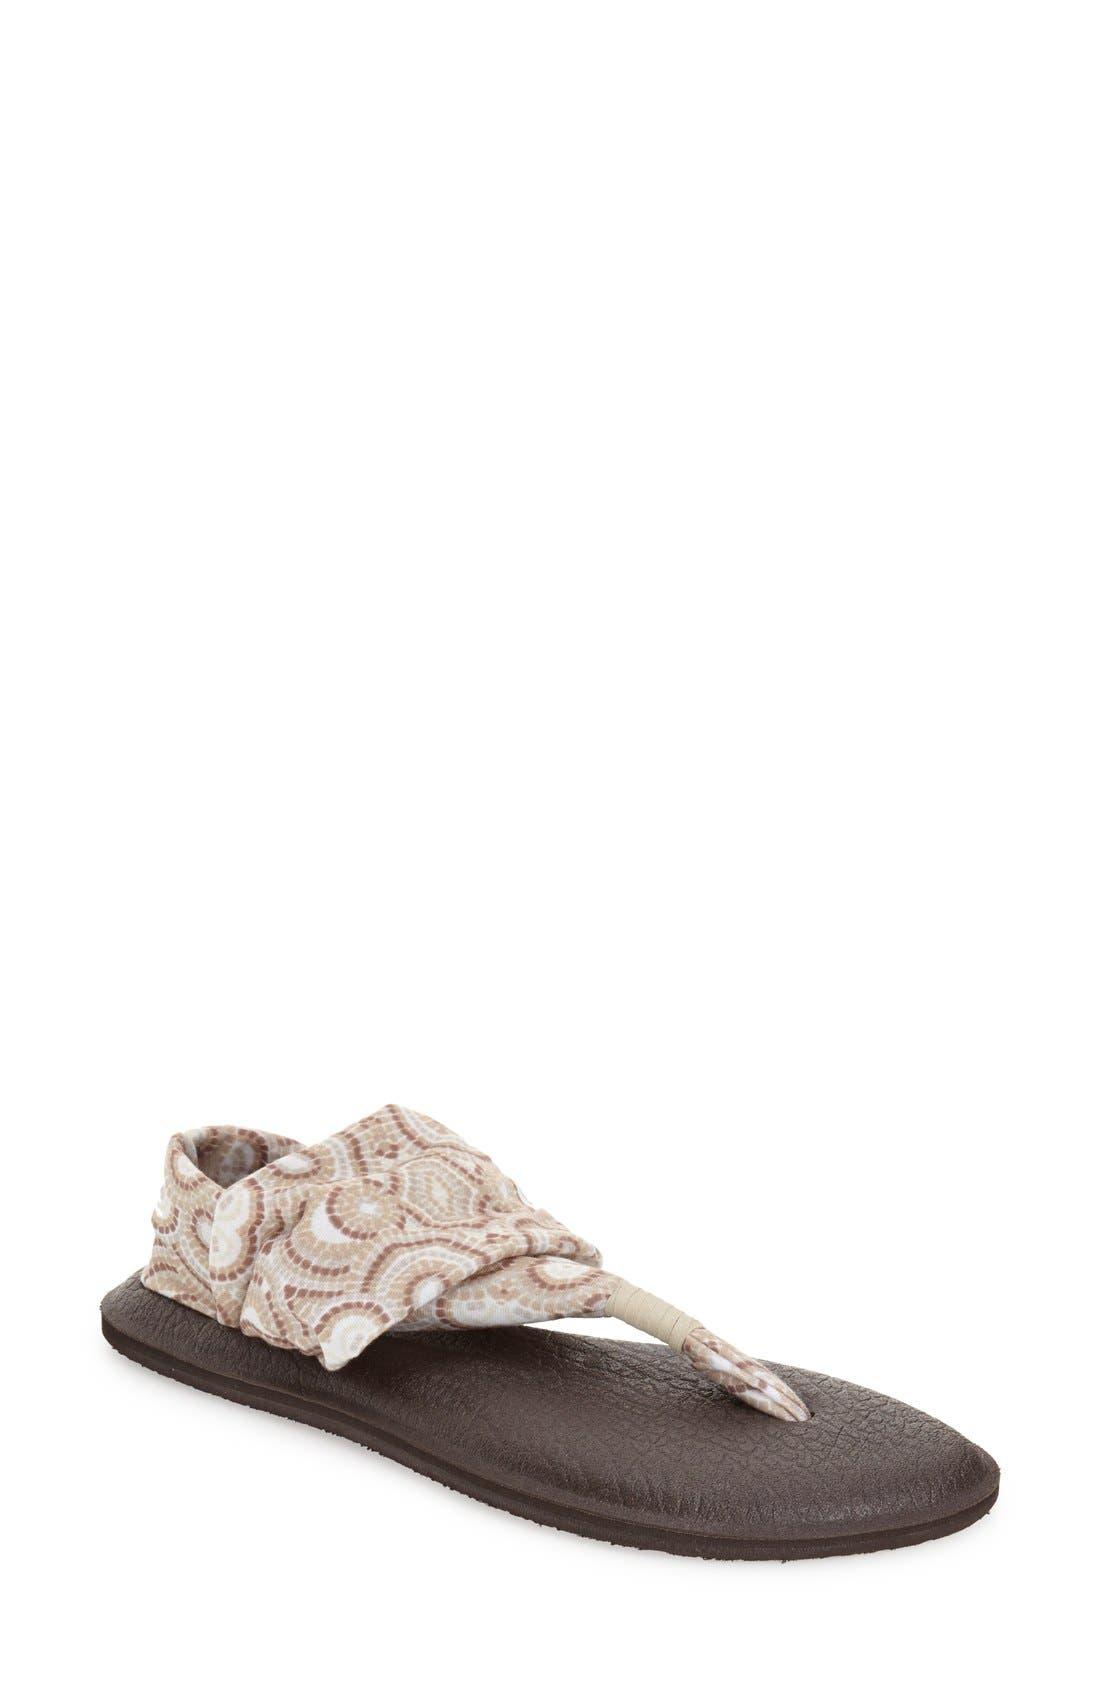 'Yoga Sling 2' Sandal,                             Main thumbnail 11, color,